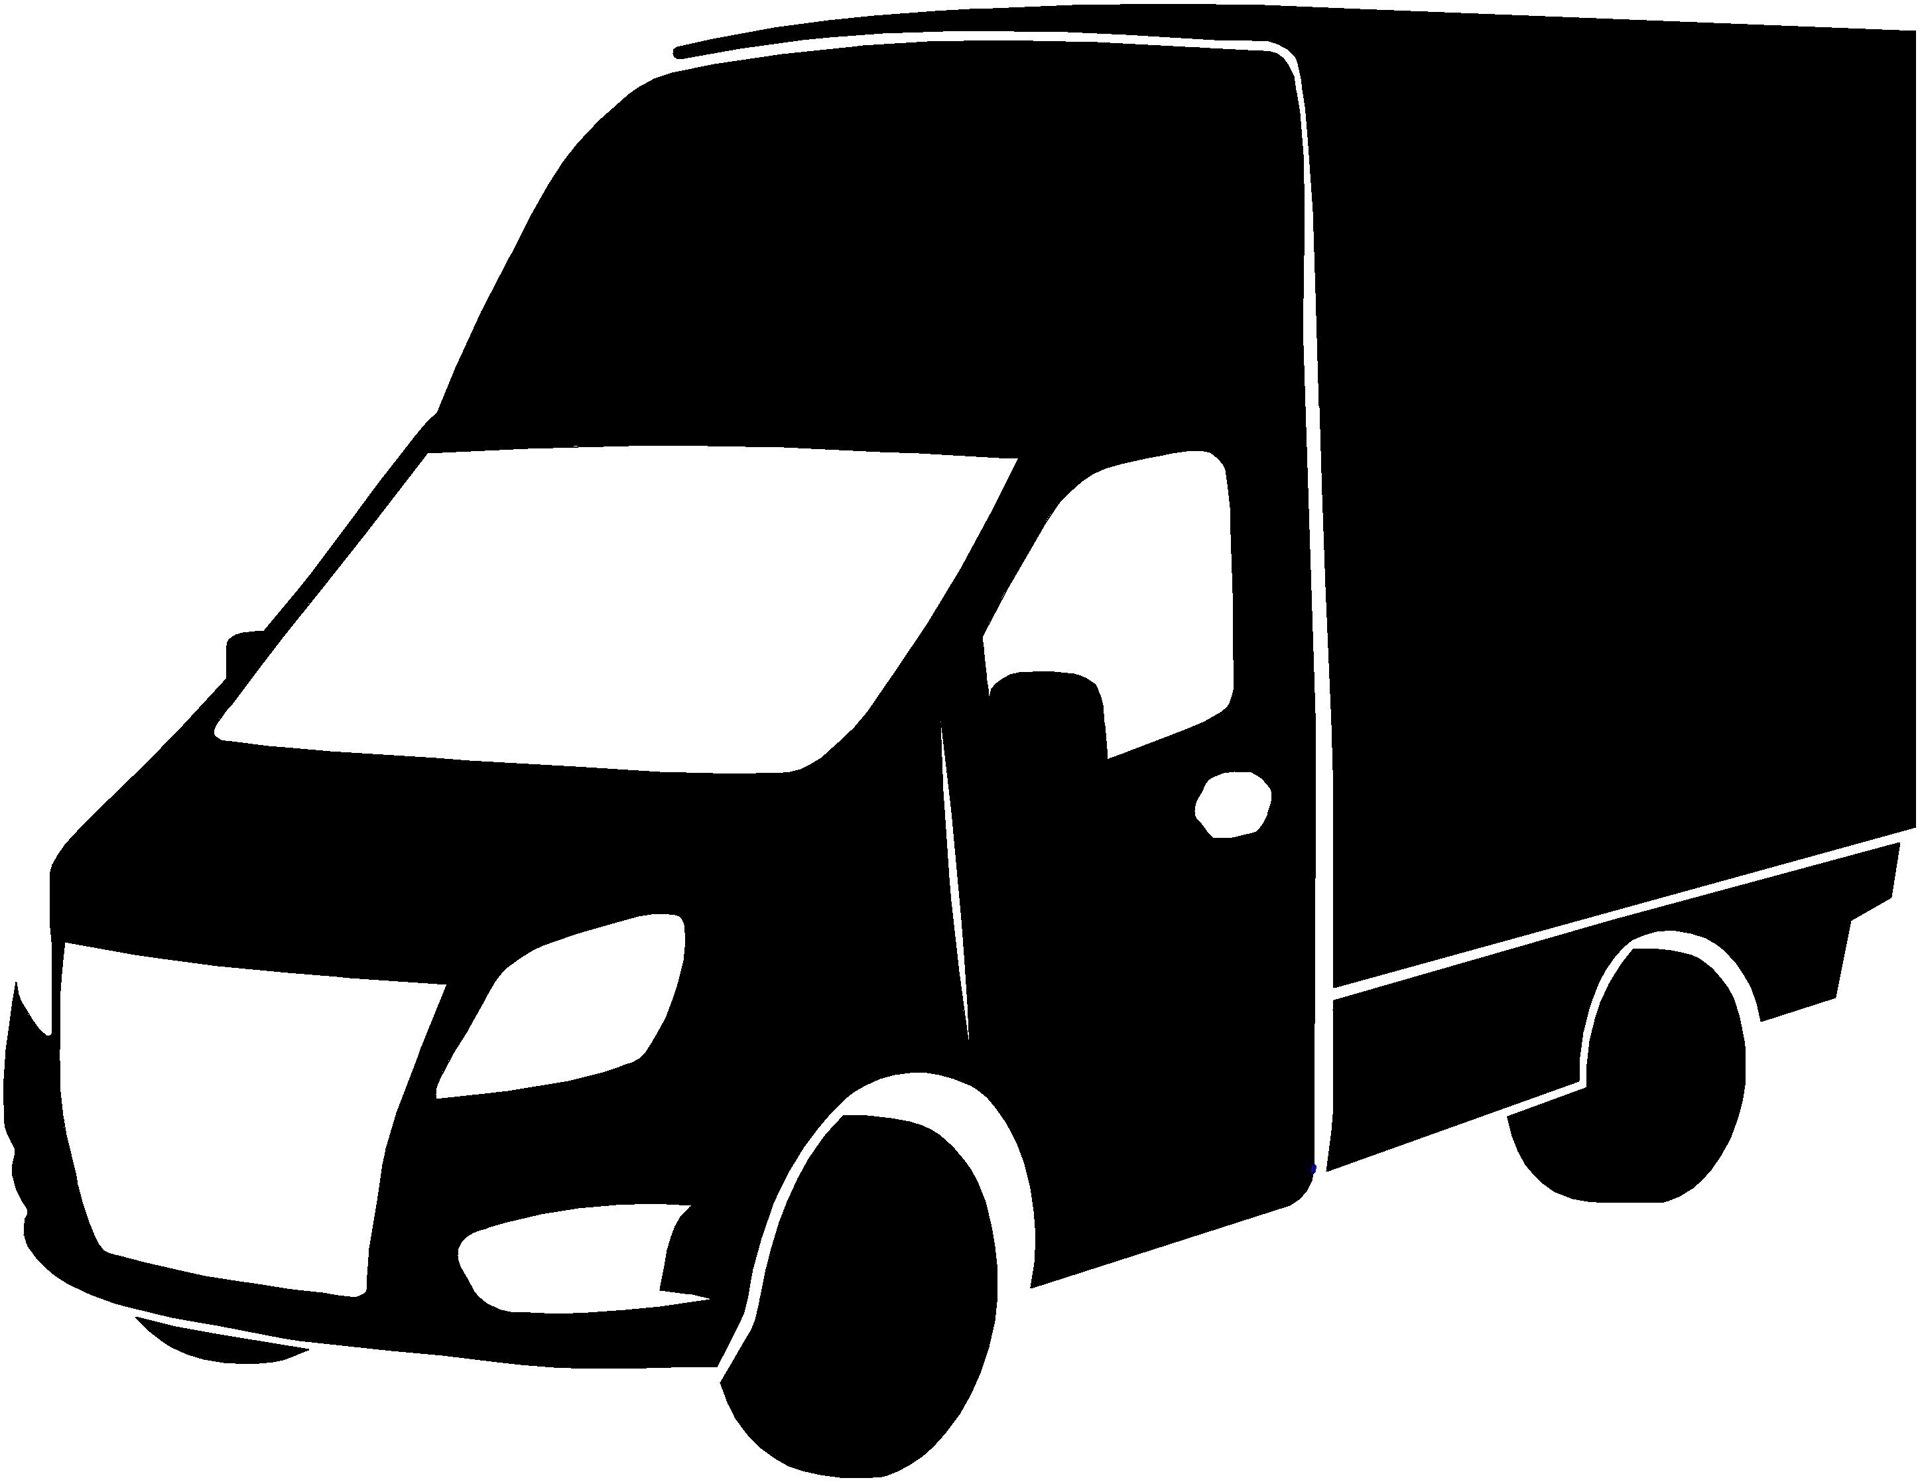 способ логотип грузоперевозок картинки стоянке обсудим задачи